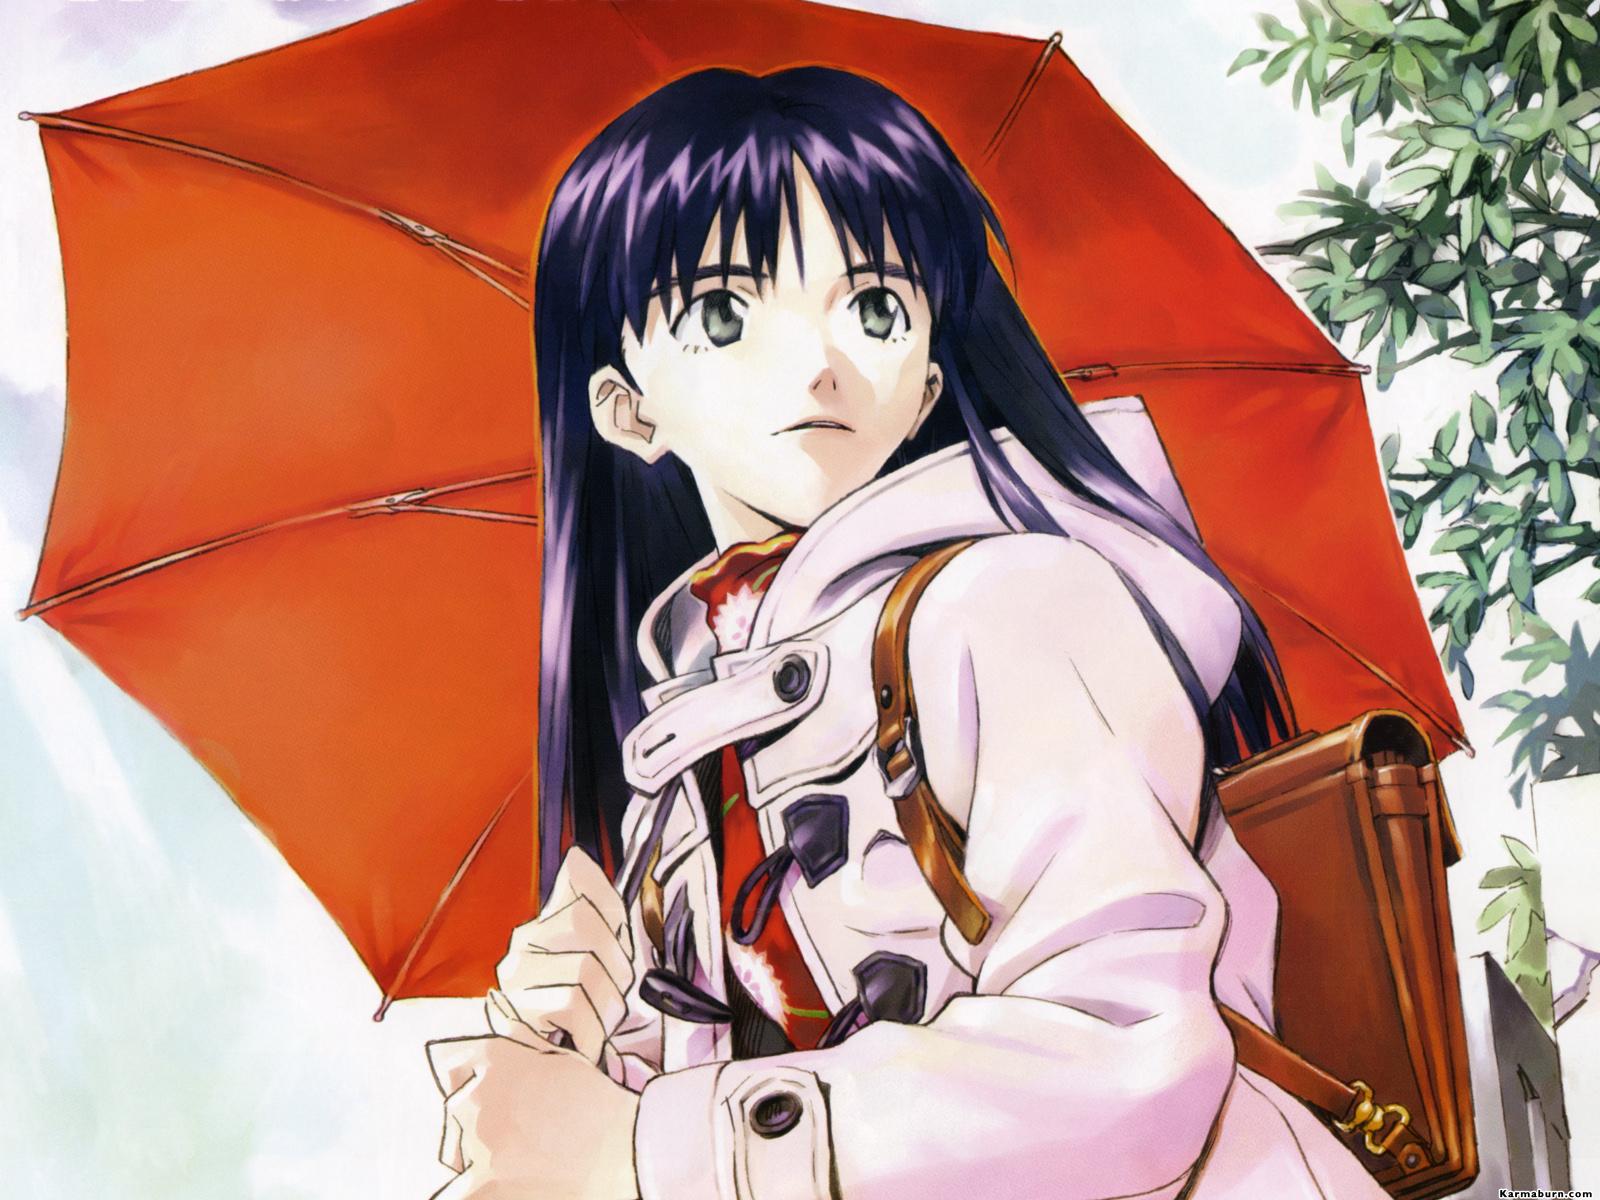 Chica anime favorita Flcl-43